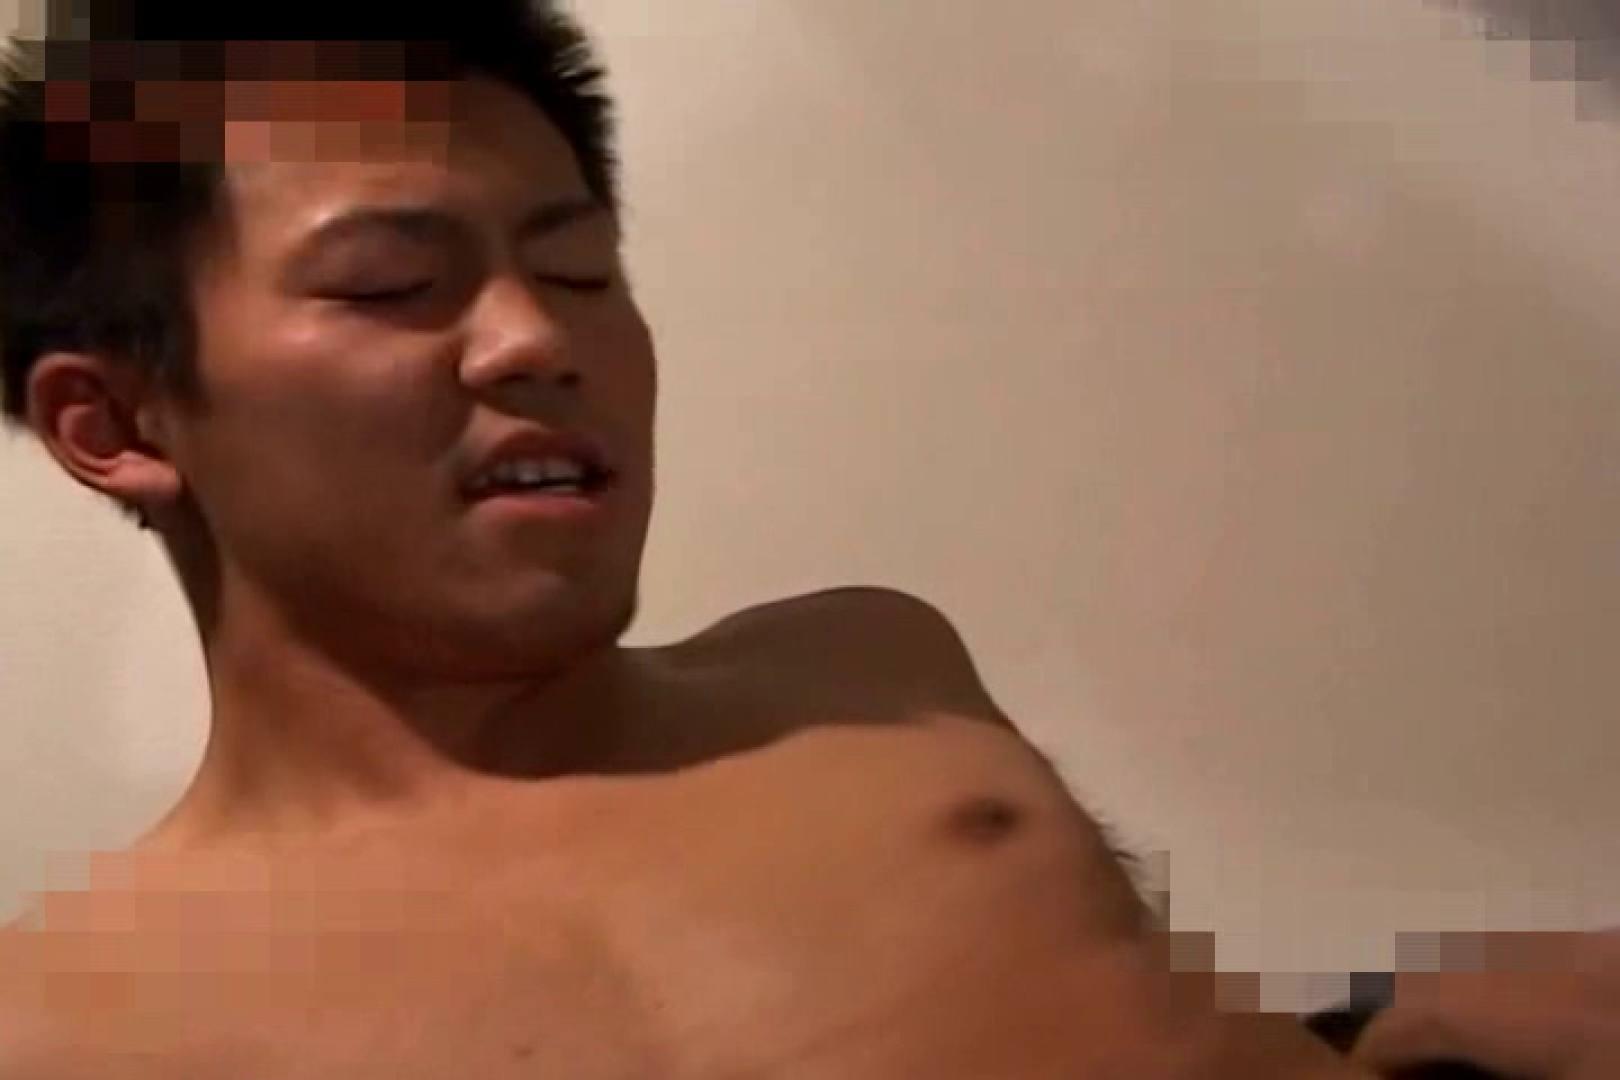 Beautiful muscle モッコリ野郎達!Vol.13 菊指 | アナル責め  98pic 71